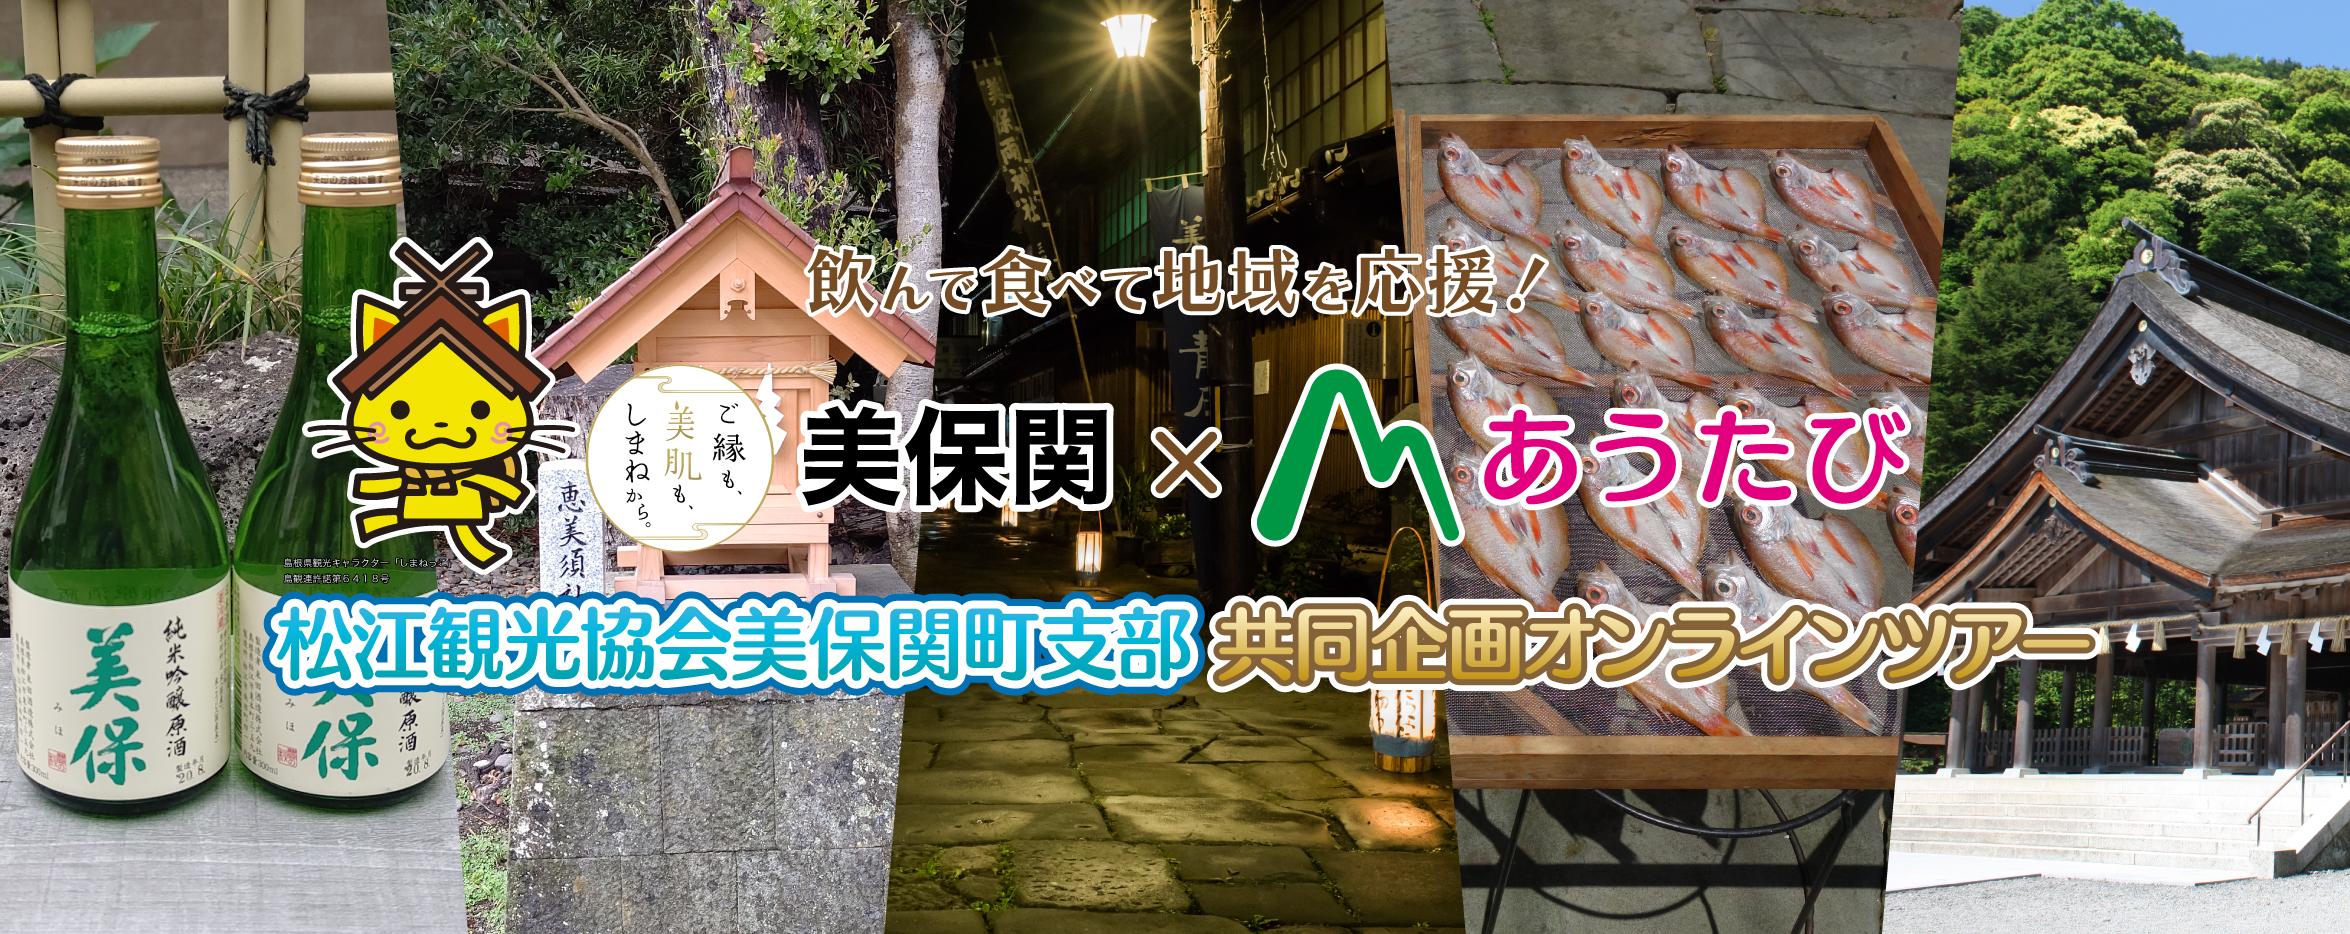 autabi_shimanemiho_tour_main_img01_201007